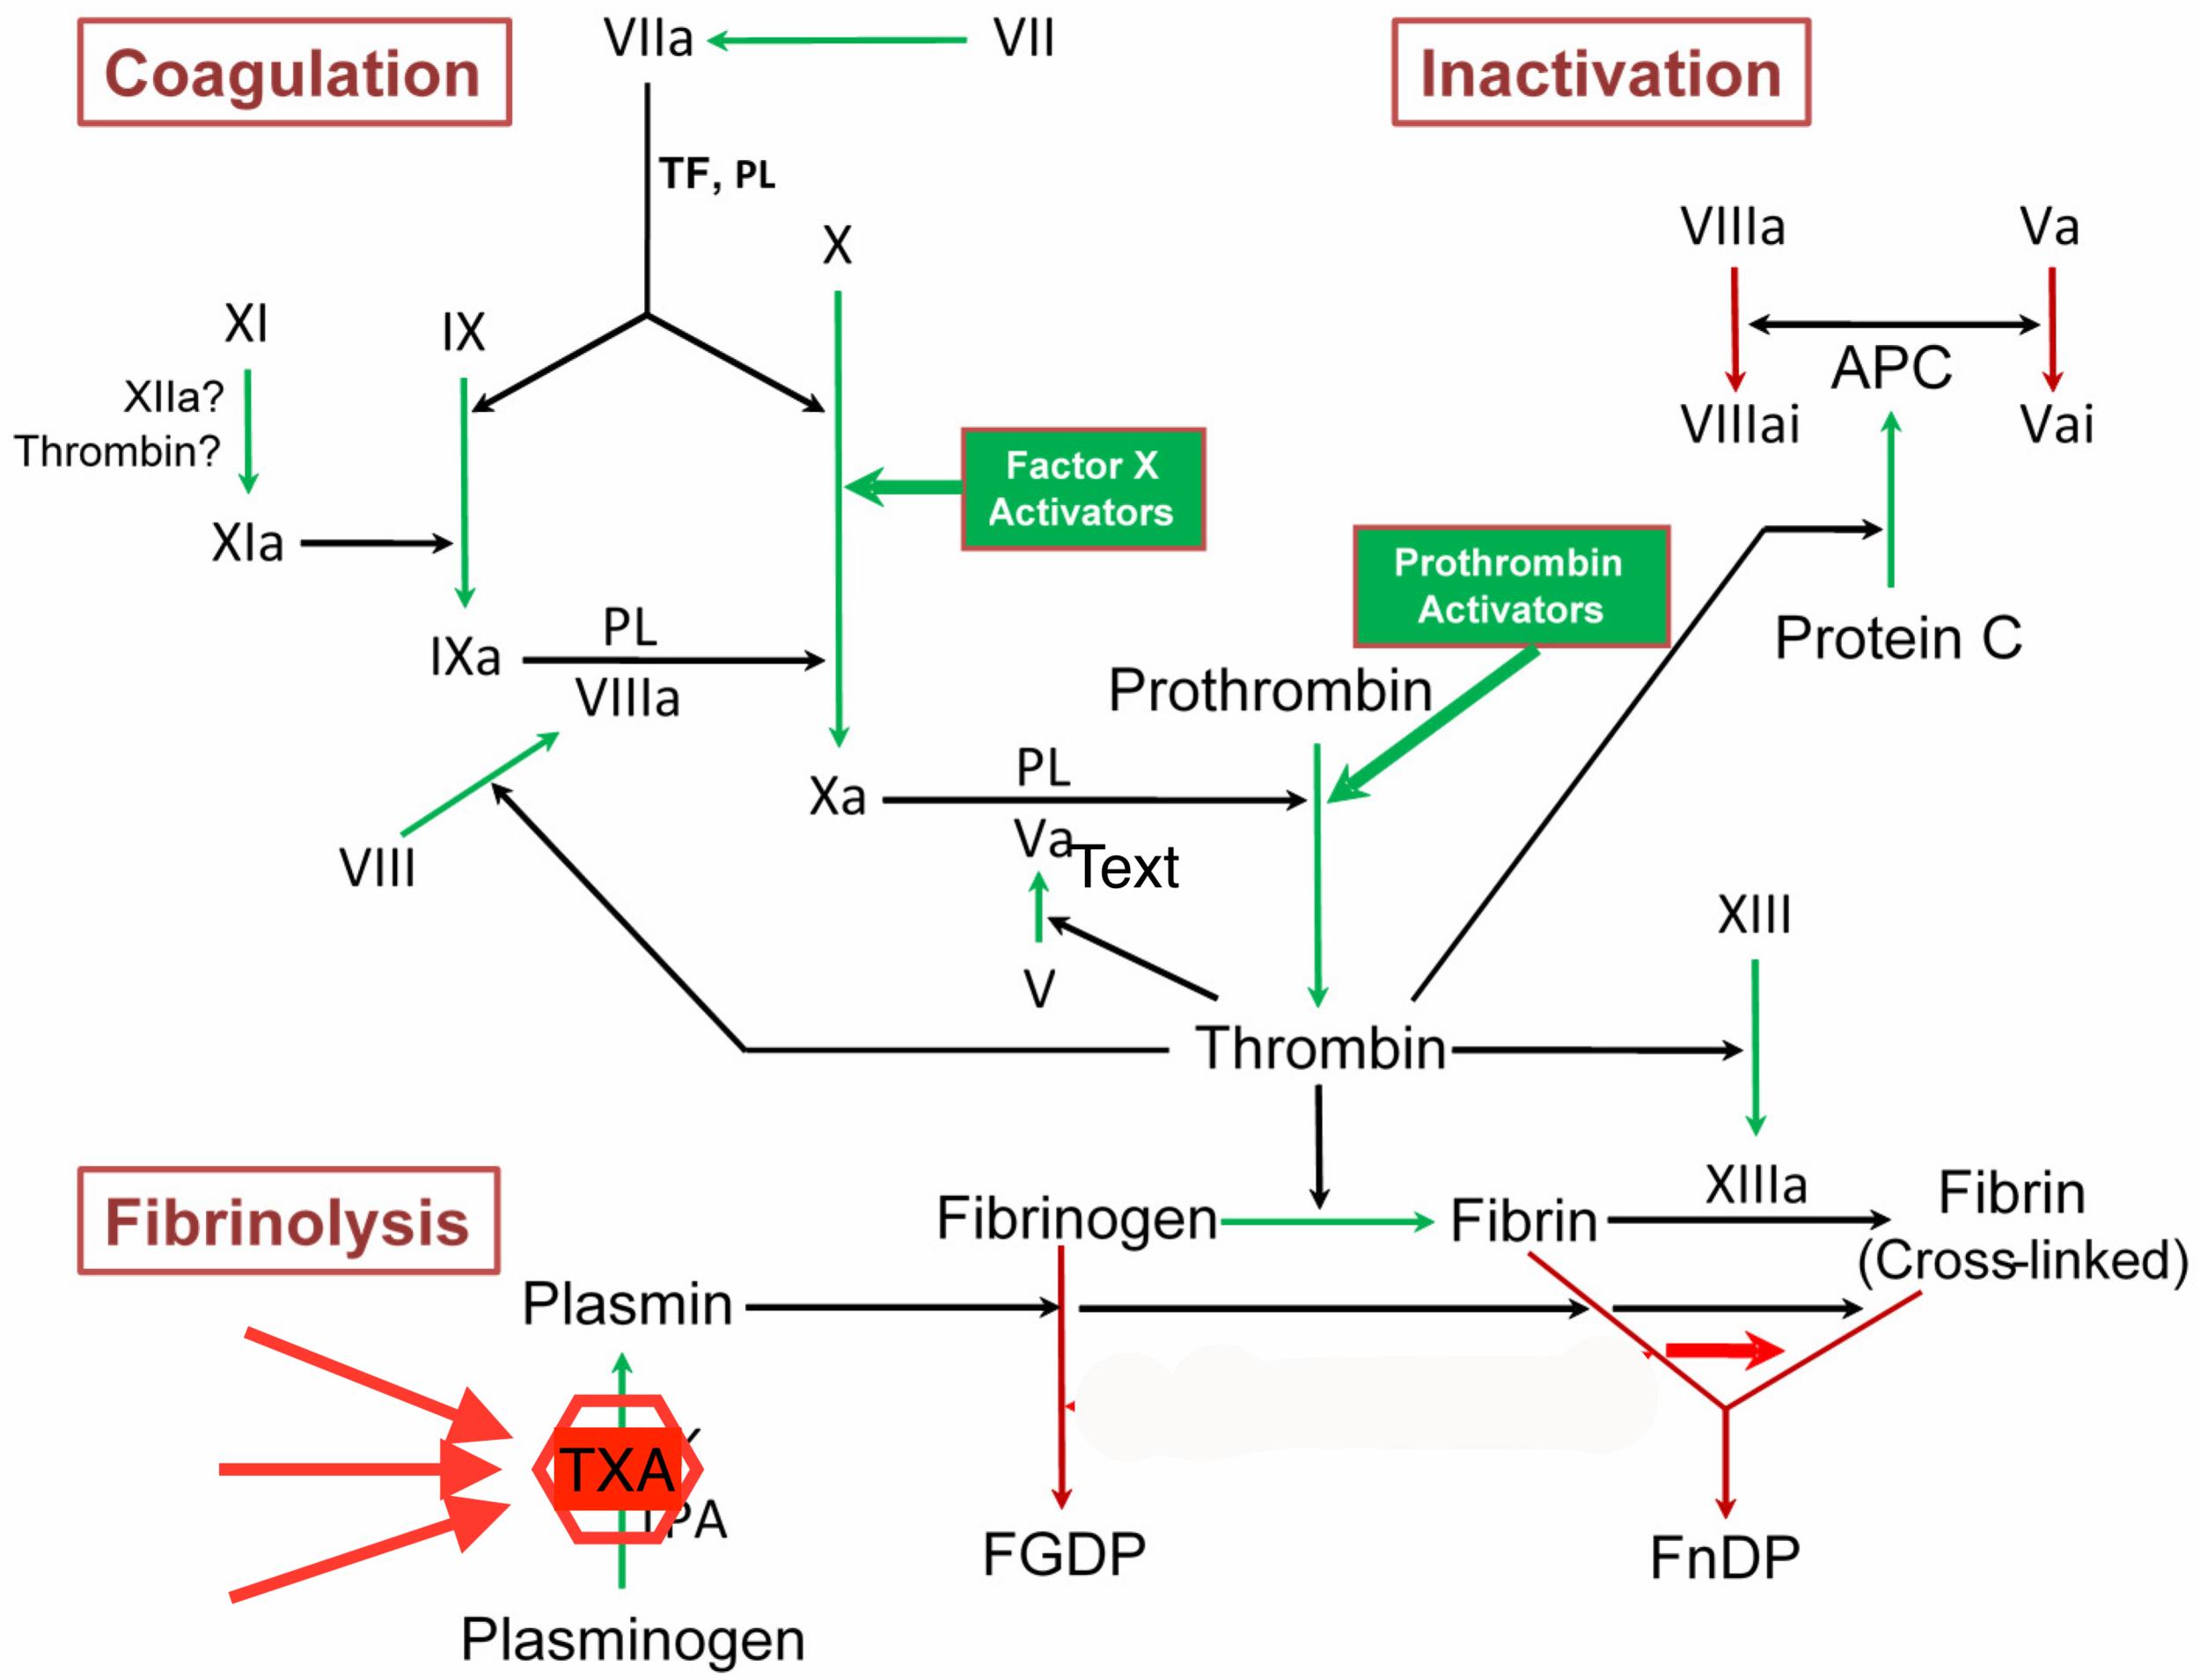 TXA stops the conversion of plasminogen to plasmin